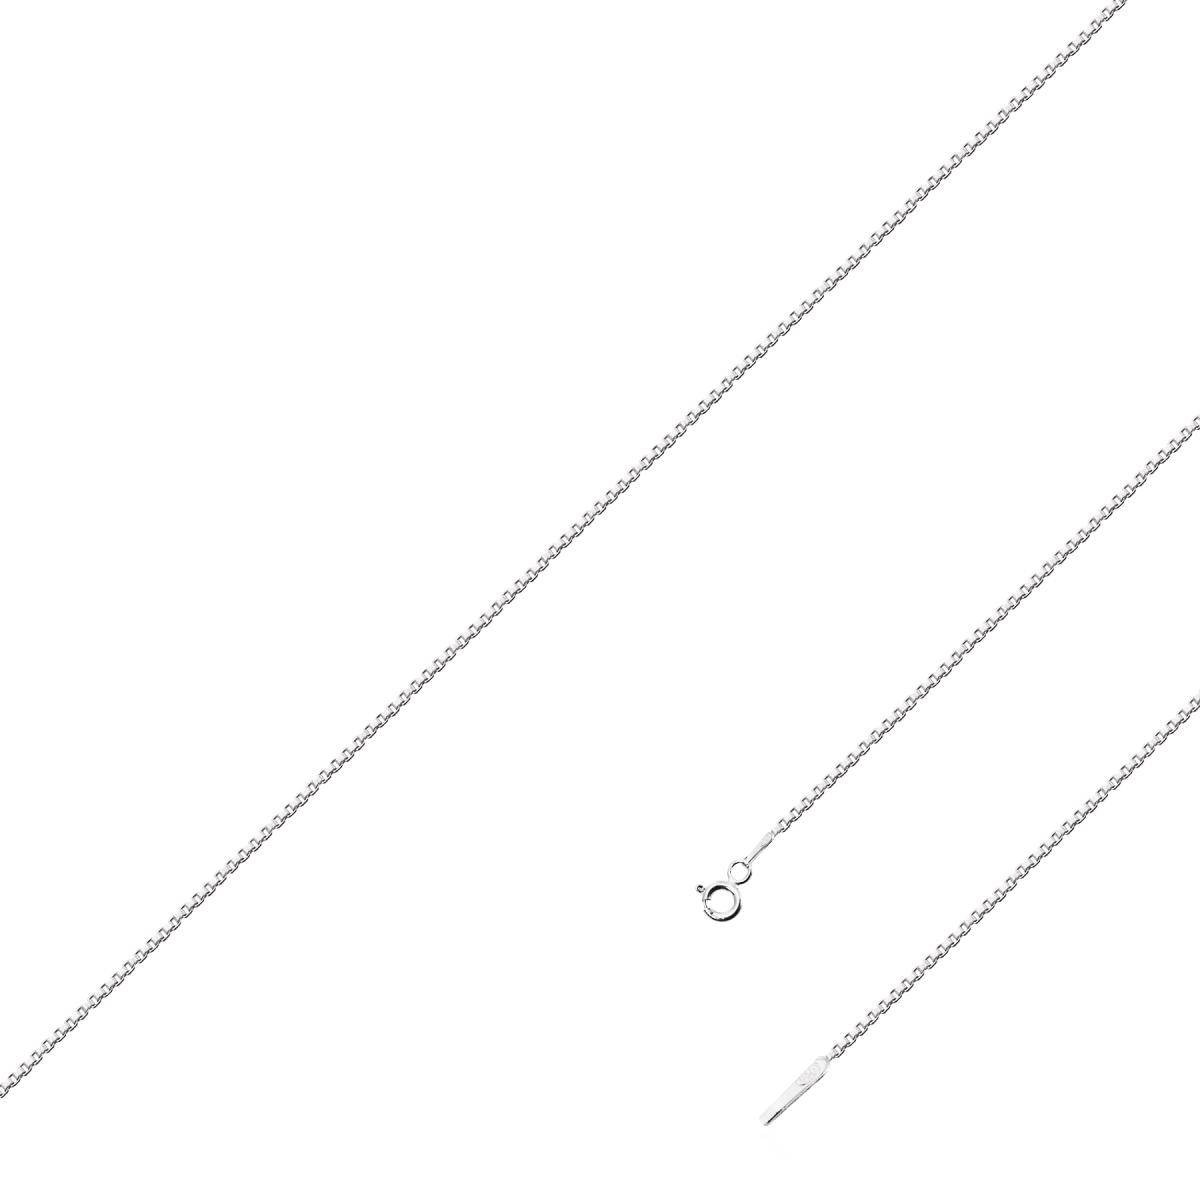 Corrente Veneziana 50 cm - Prata Branca